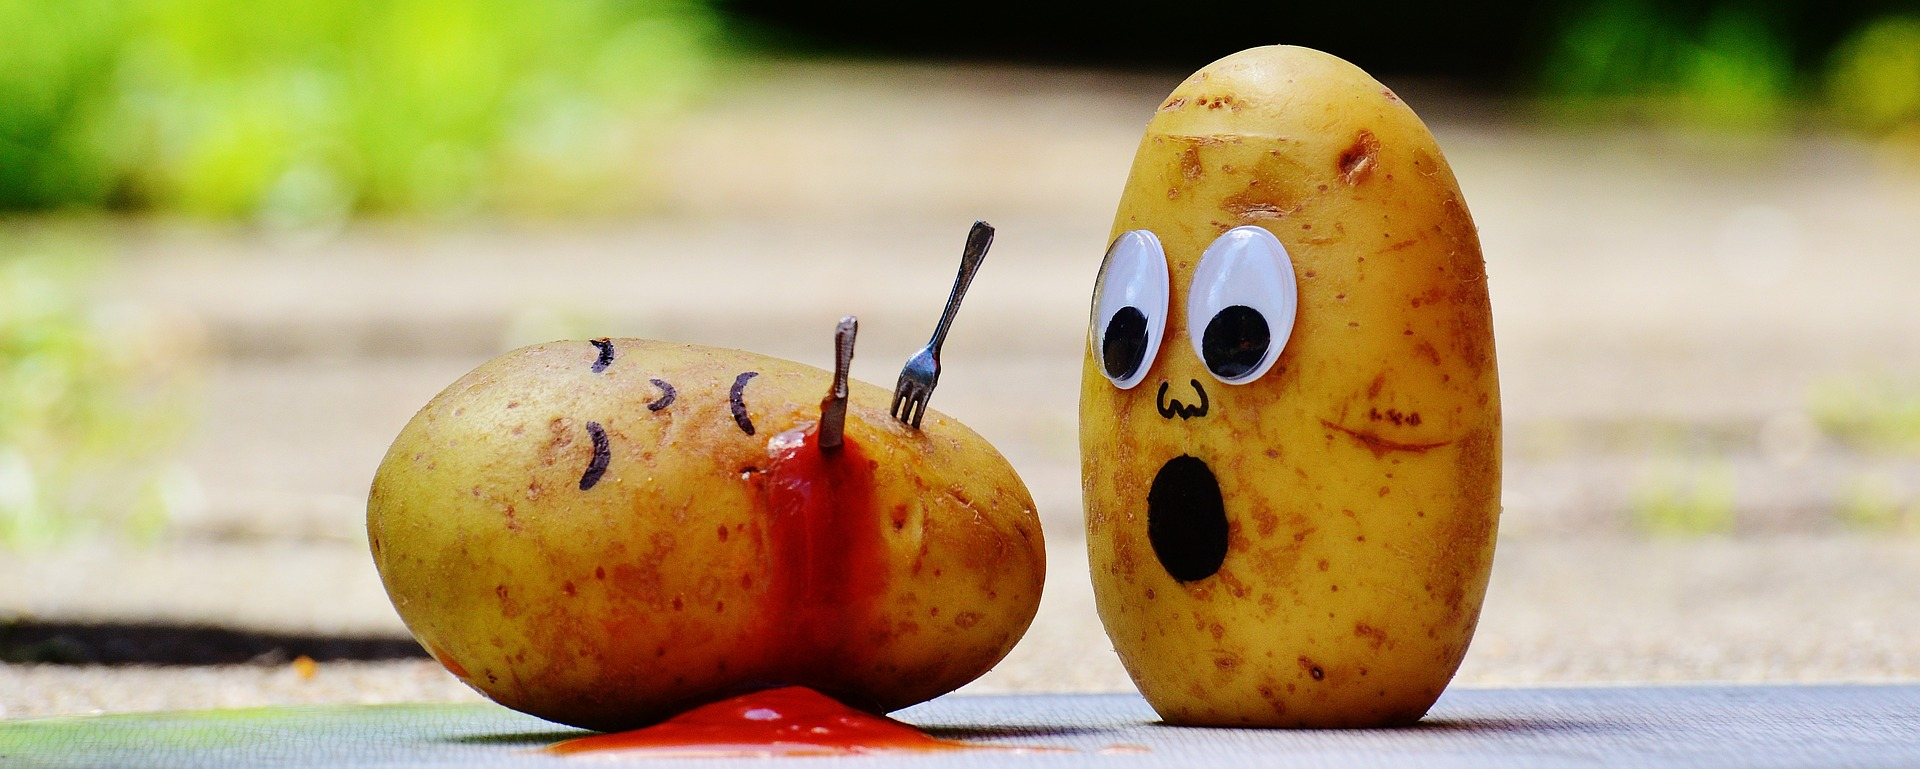 potatoes-1448402_1920.jpg